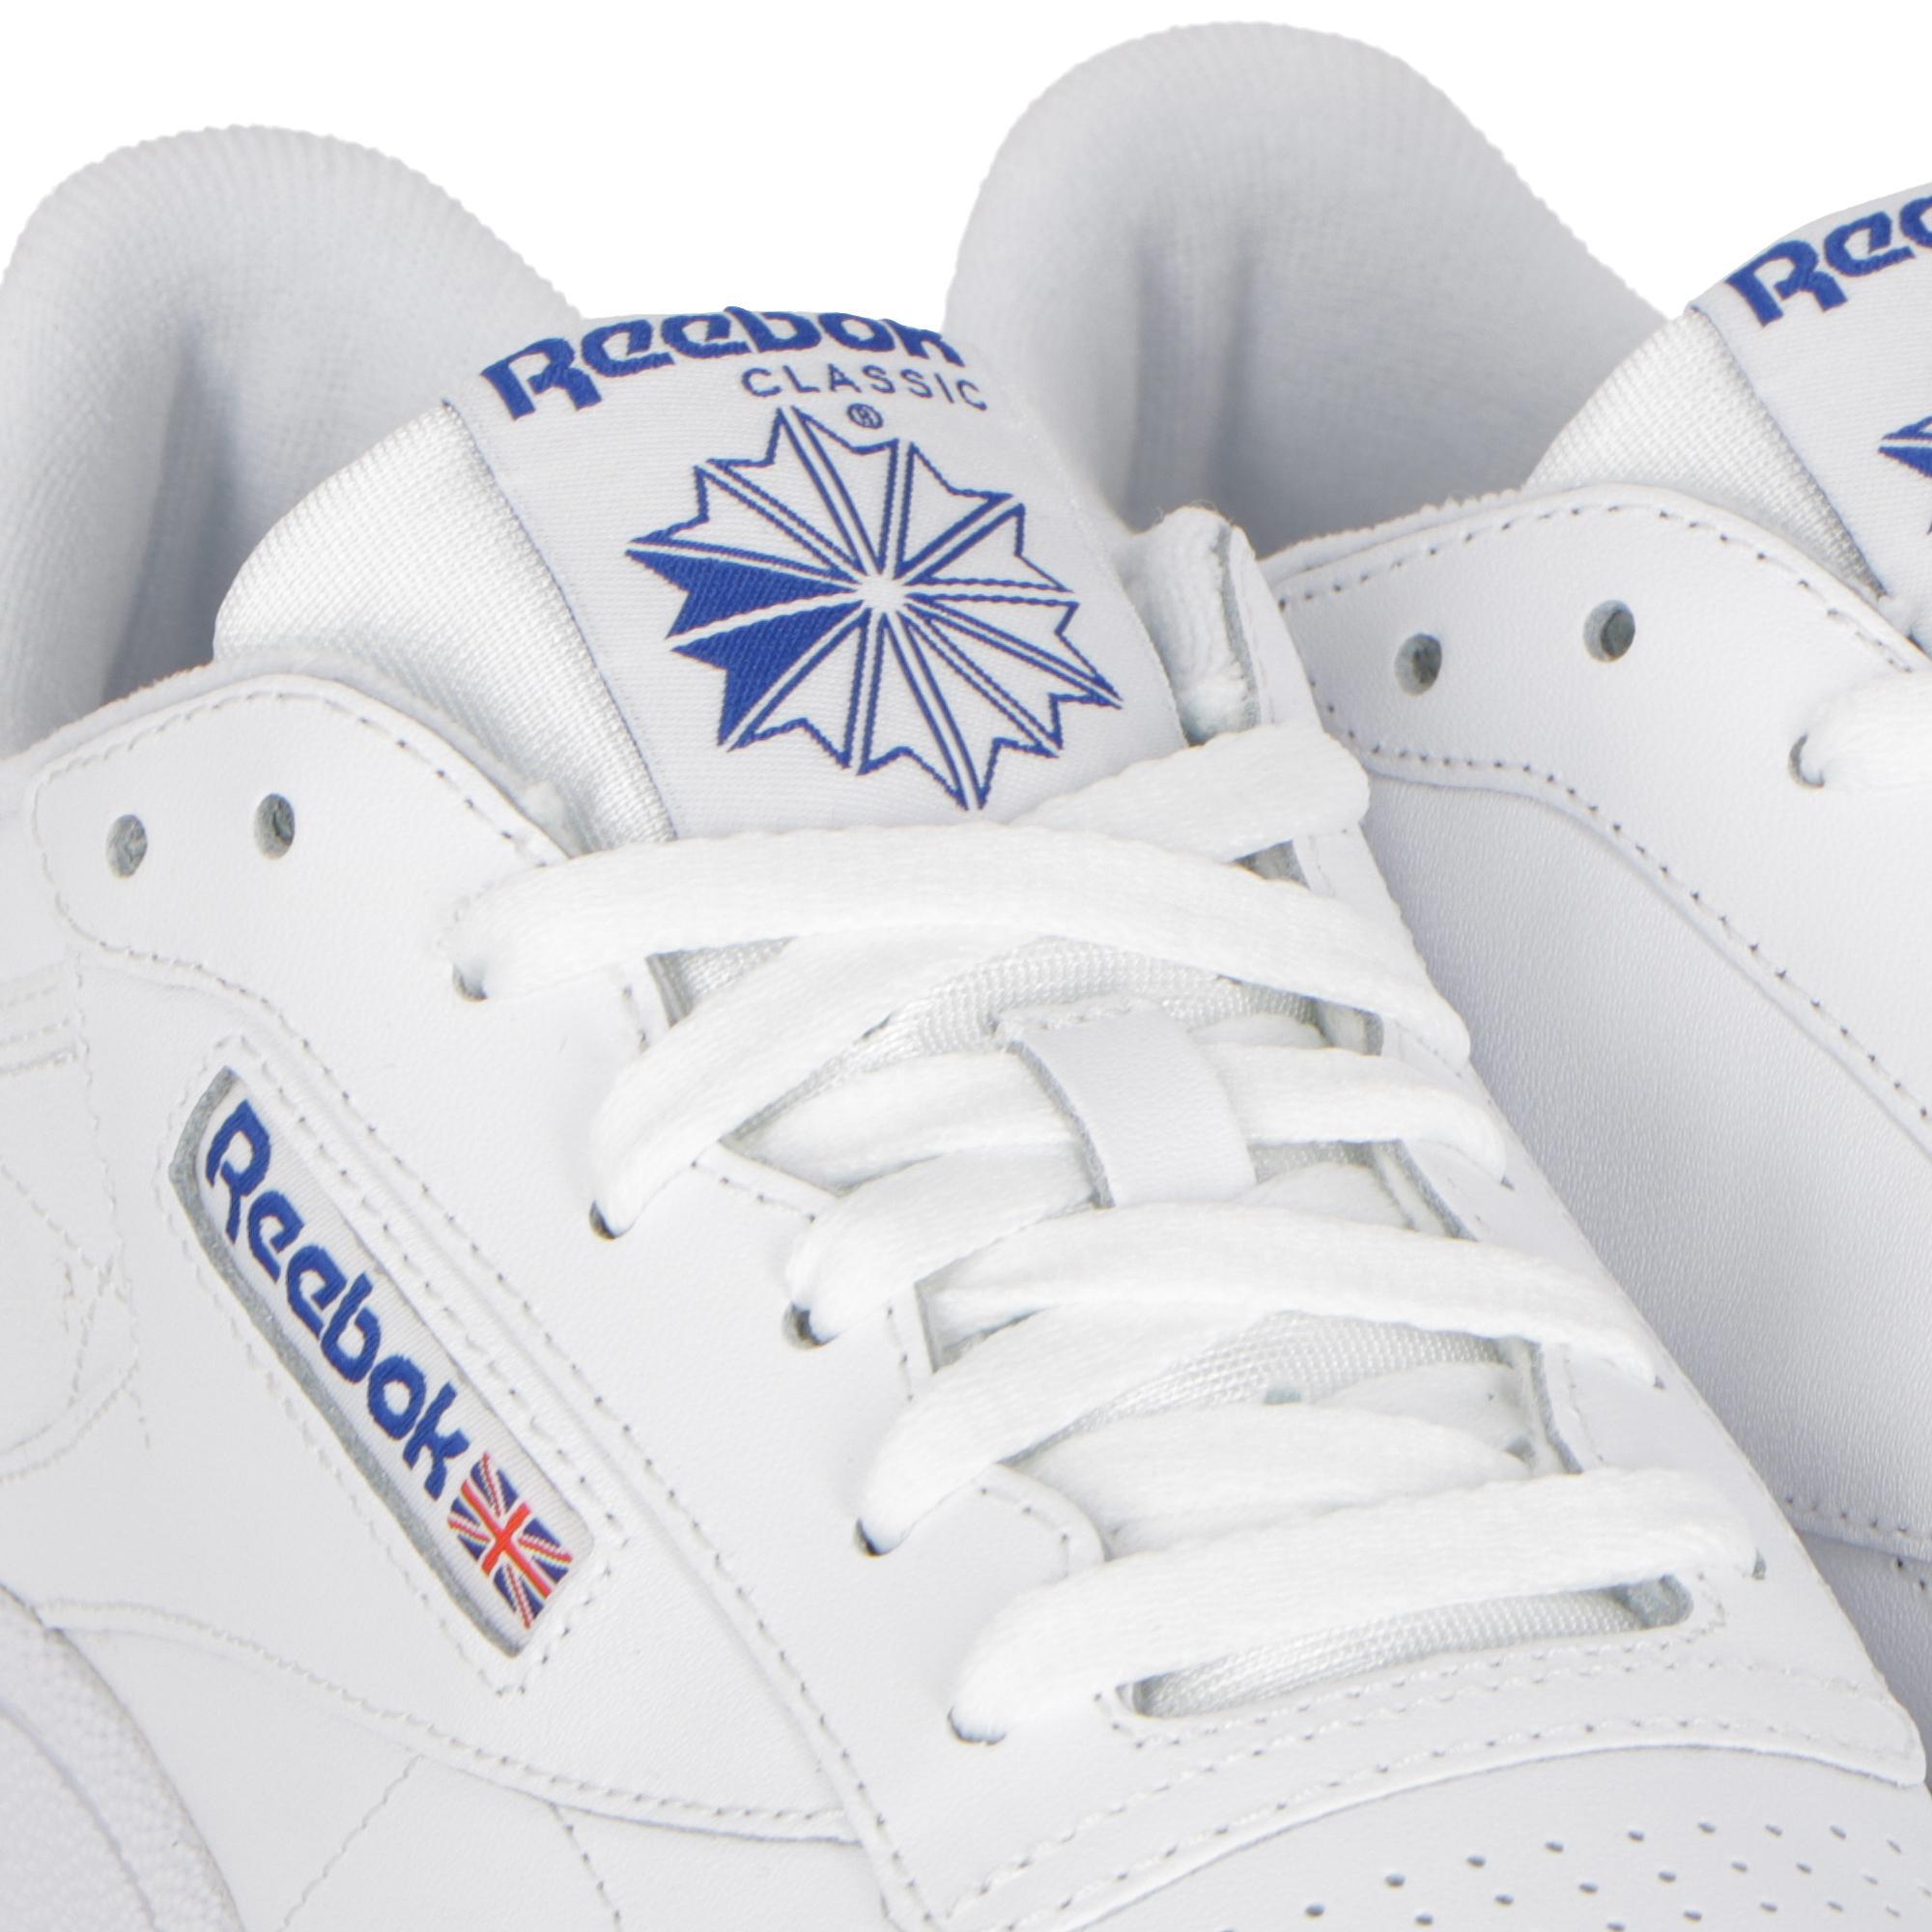 dc4be18a2b7 Reebok Club C 85 Int-white royal-gum